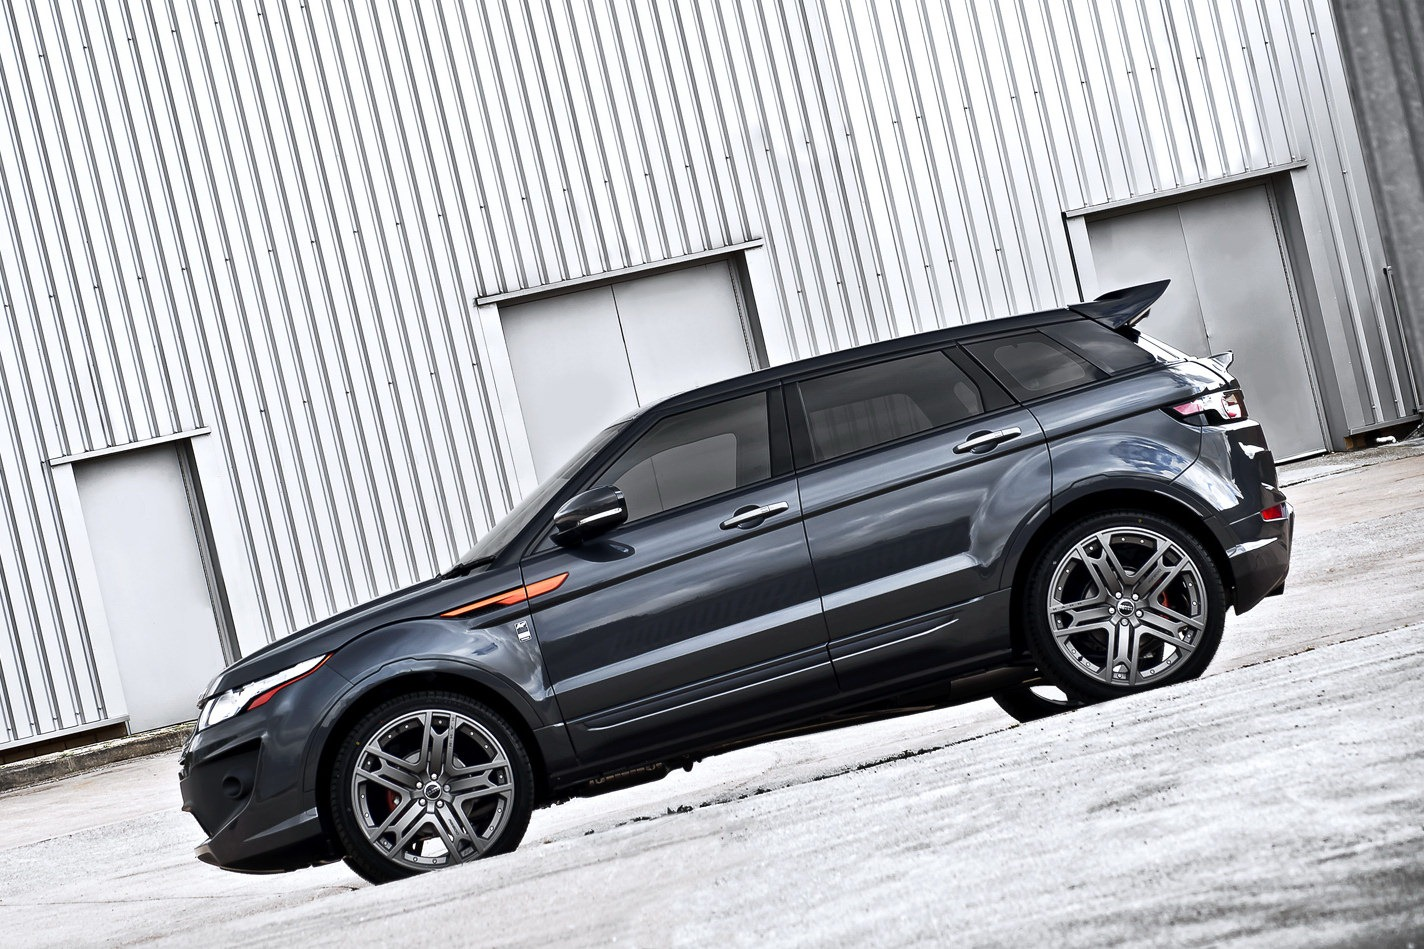 Kahn Design unveils Range Rover Evoque RS250